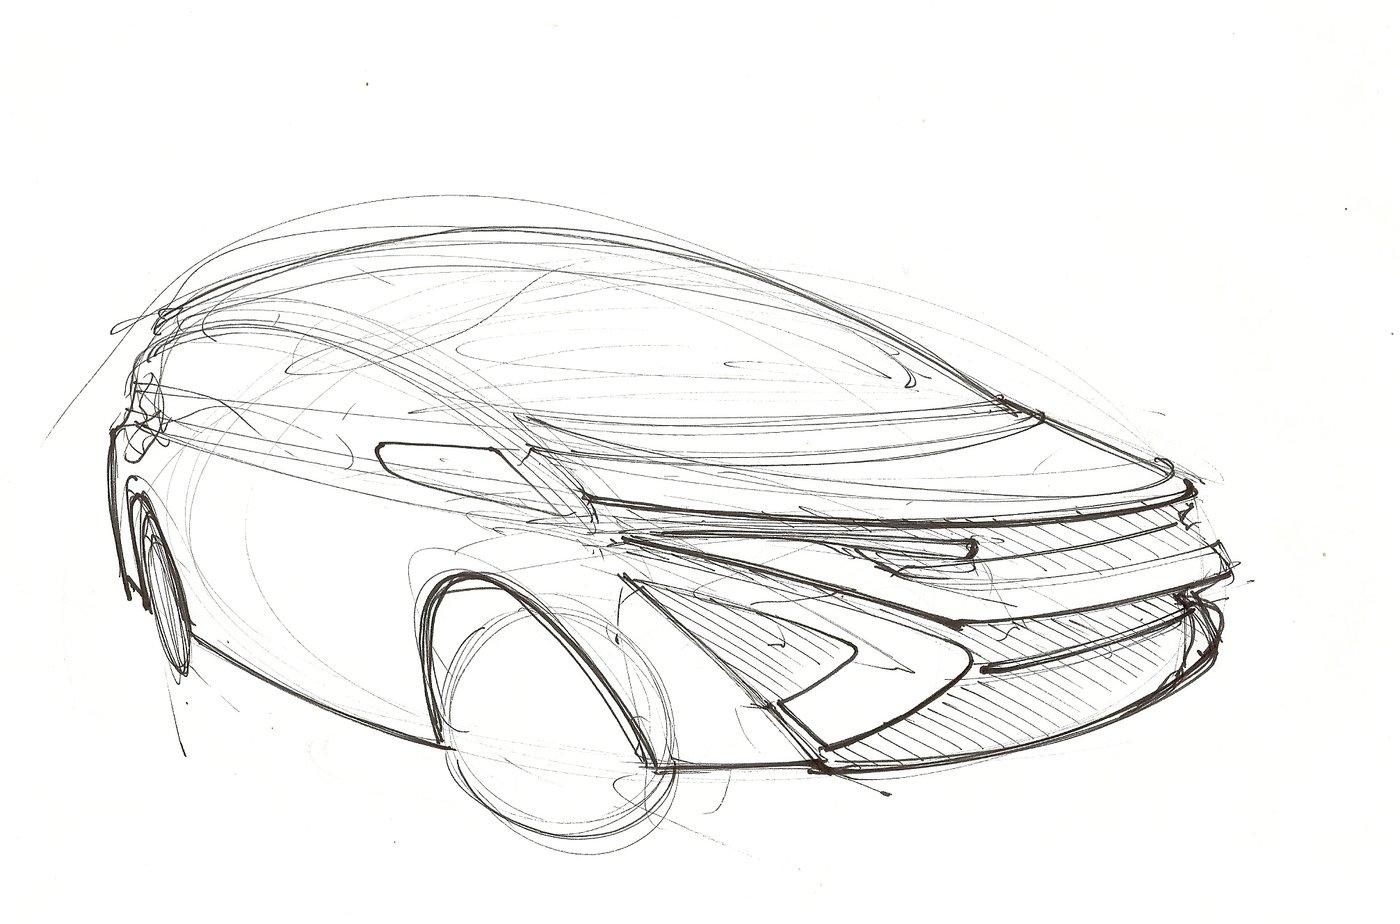 Vehicle By Jacob Stanton At Coroflot